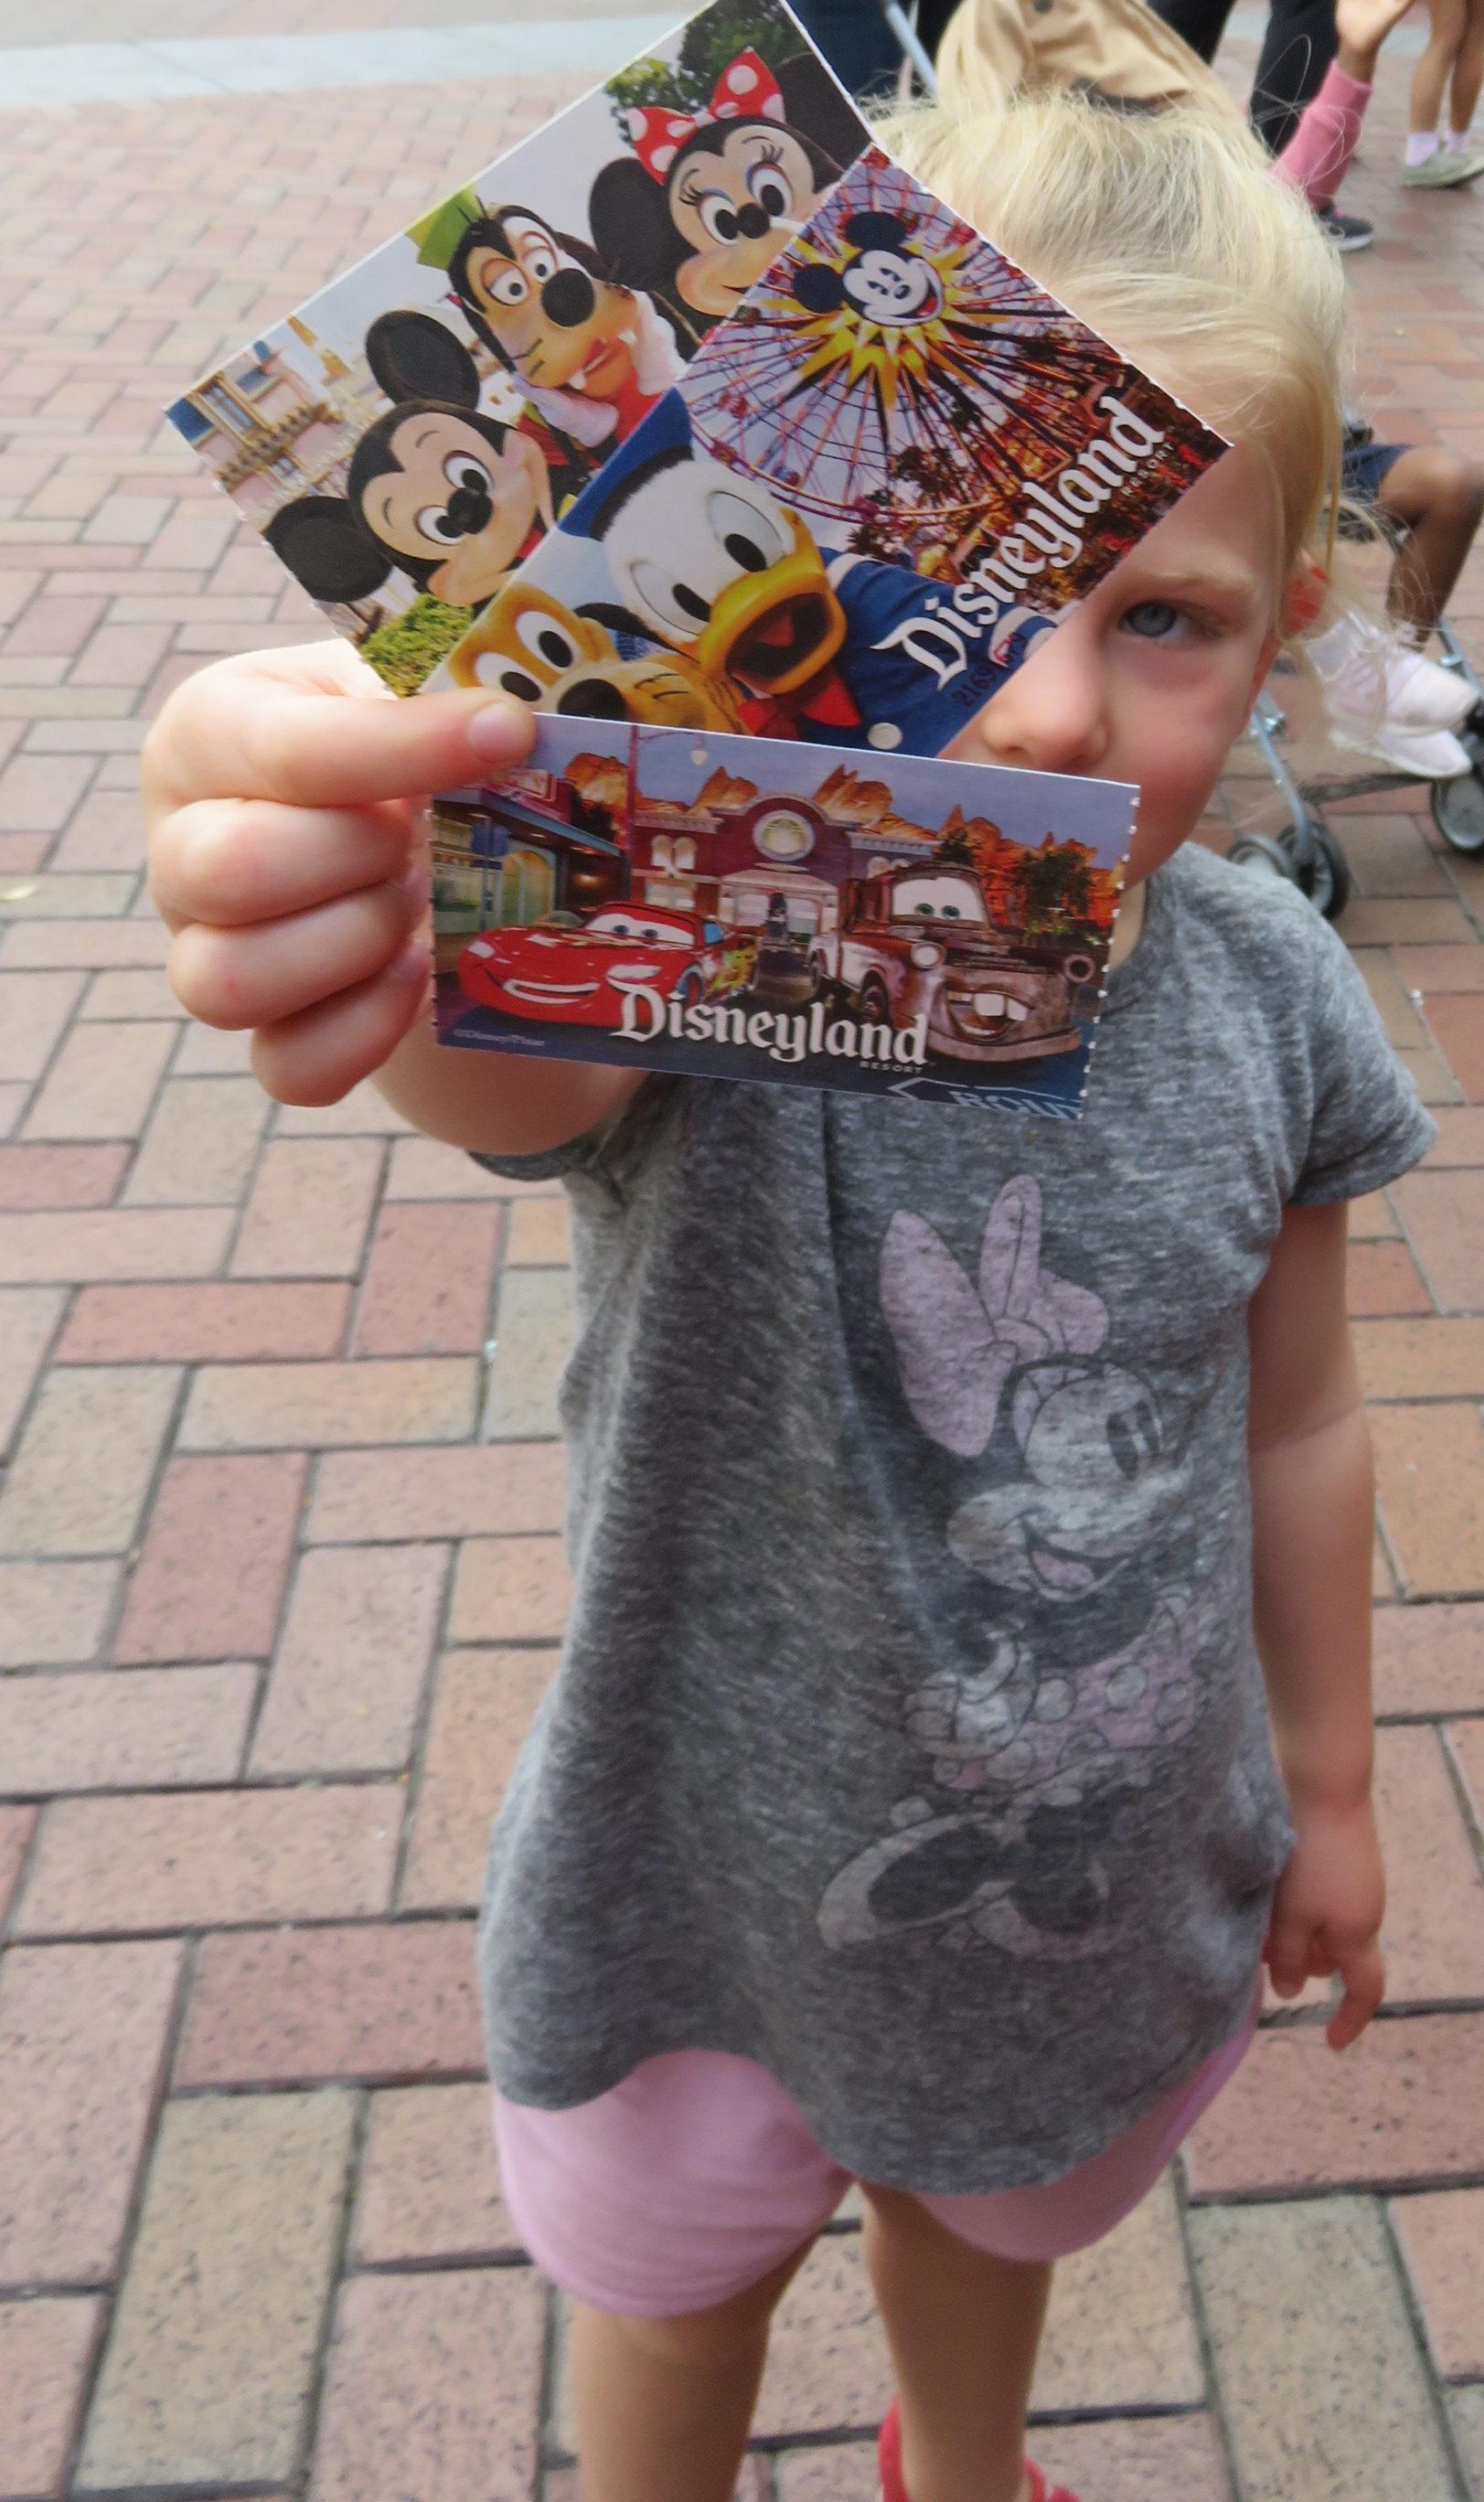 Disneyland Resort California for Kids Under 5s